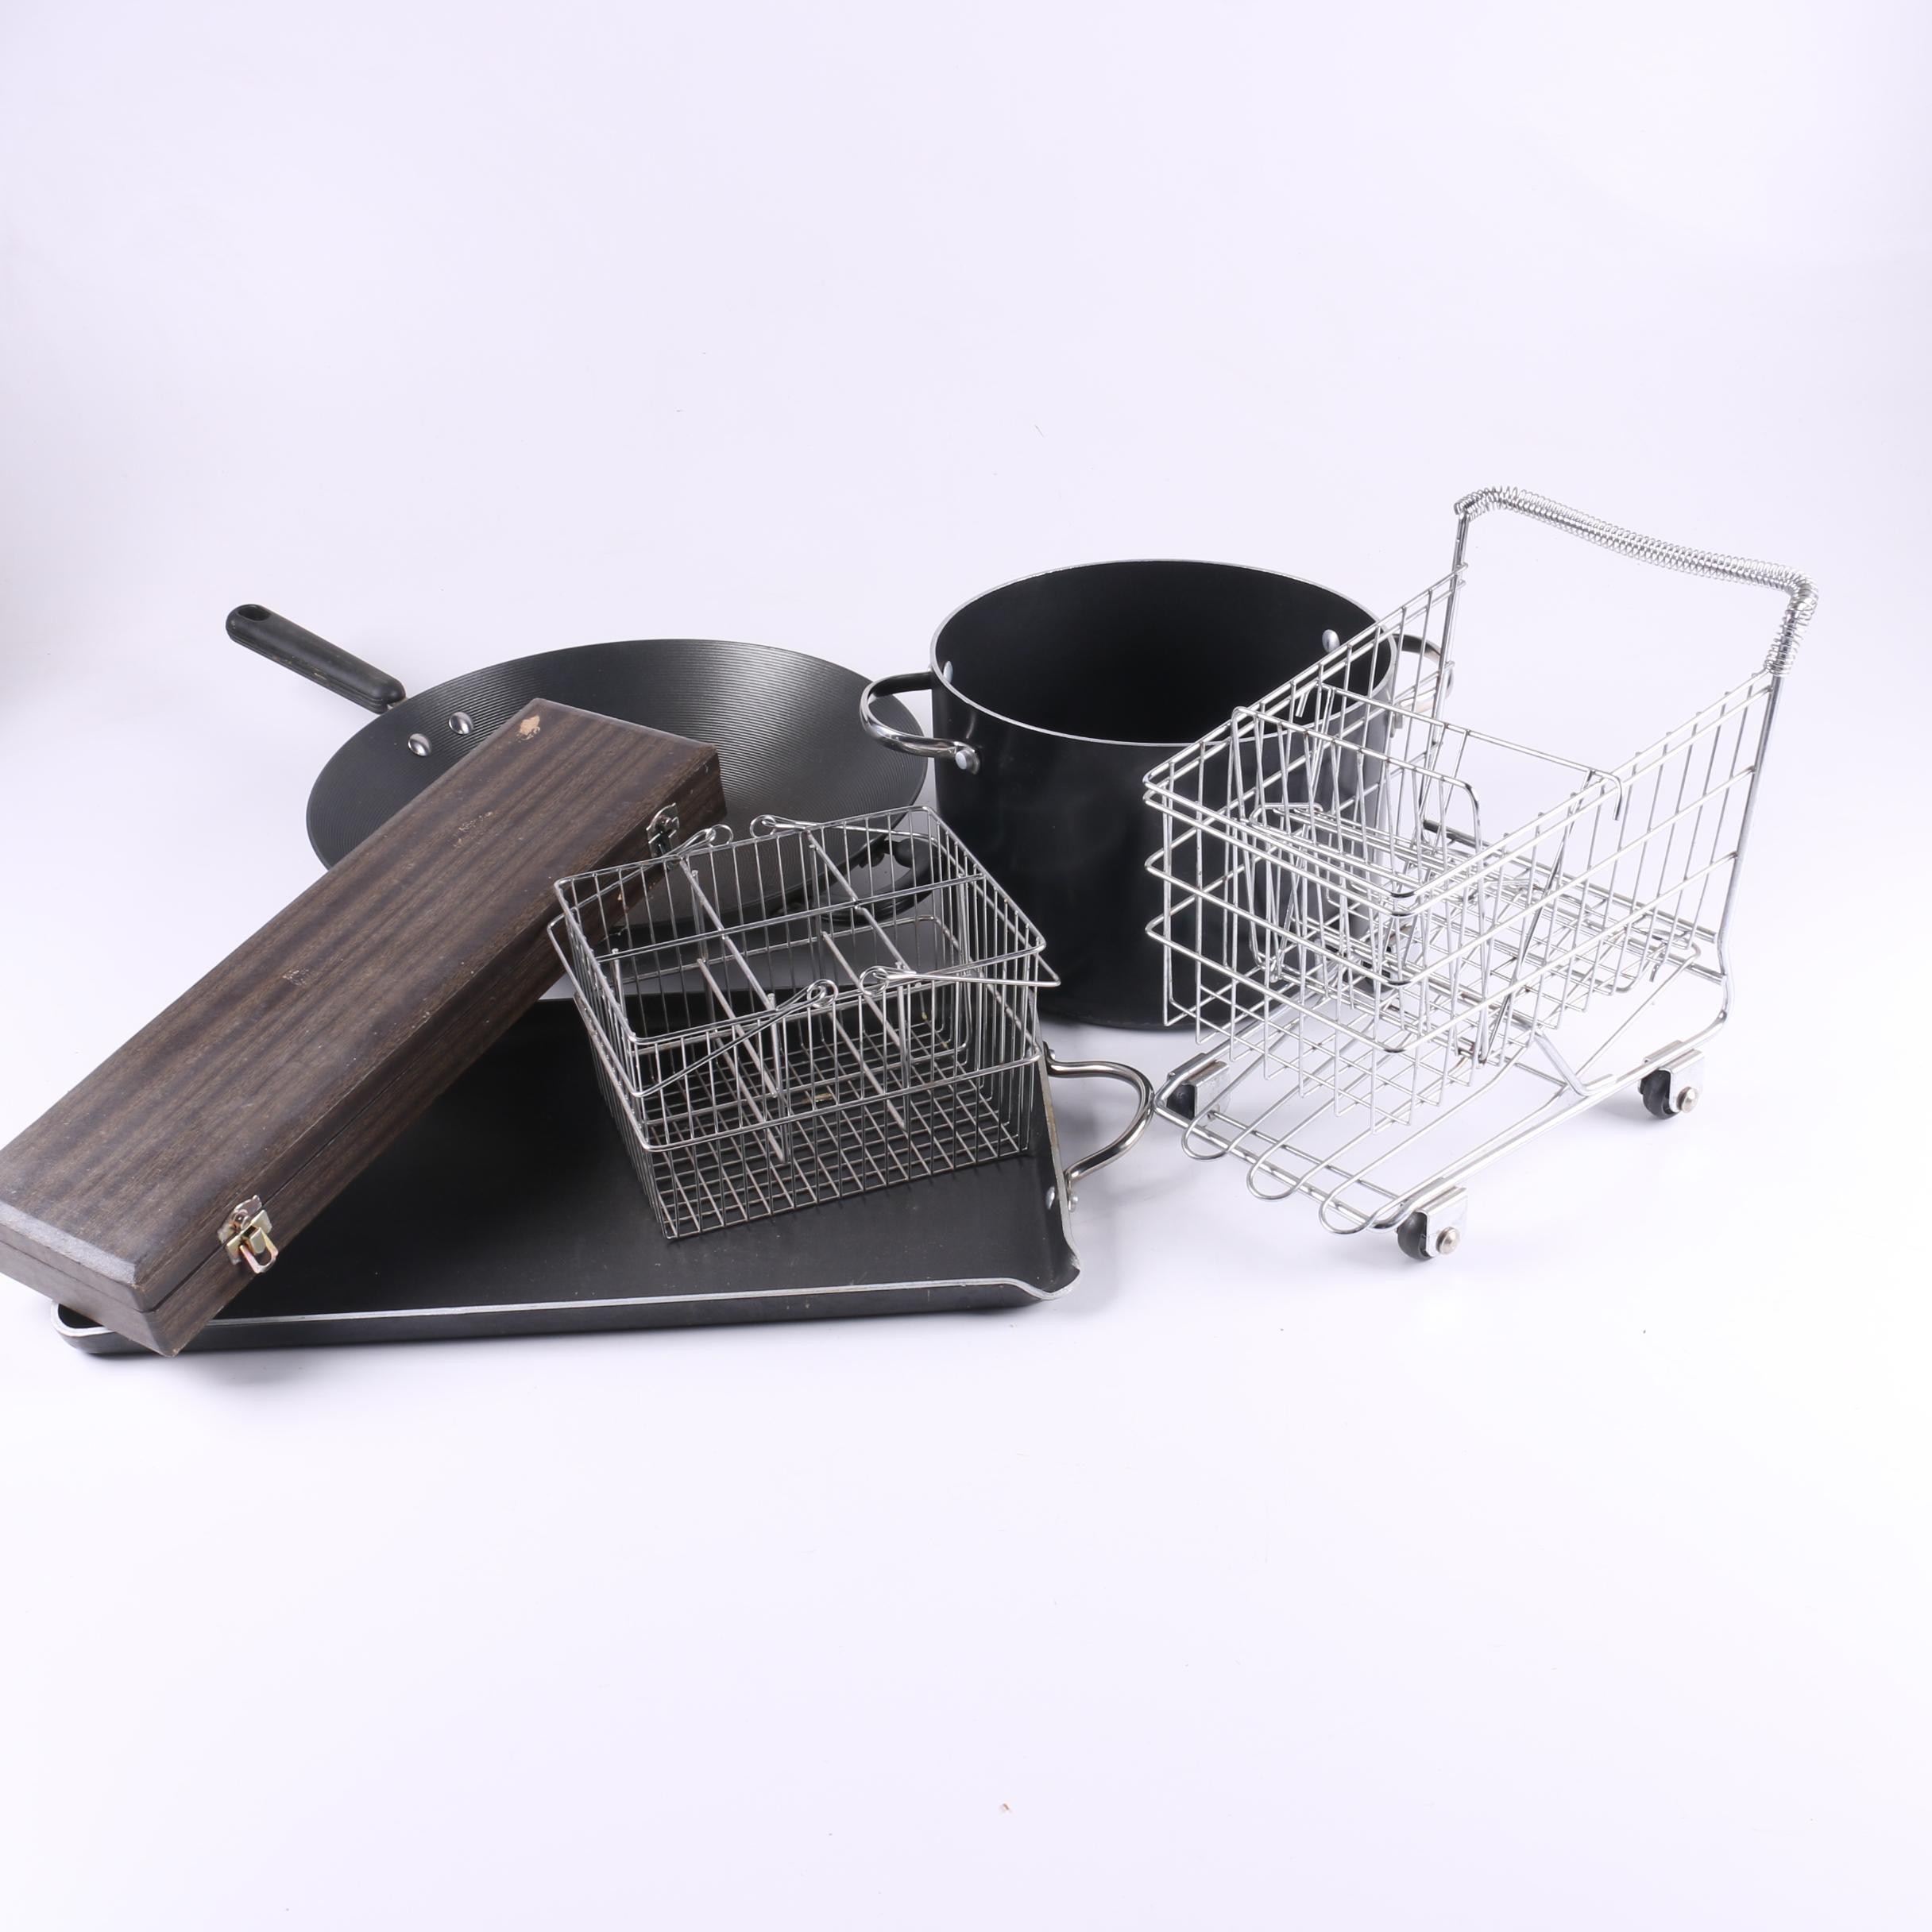 Eclectic Kitchenware Assortment Including Faberware Pots